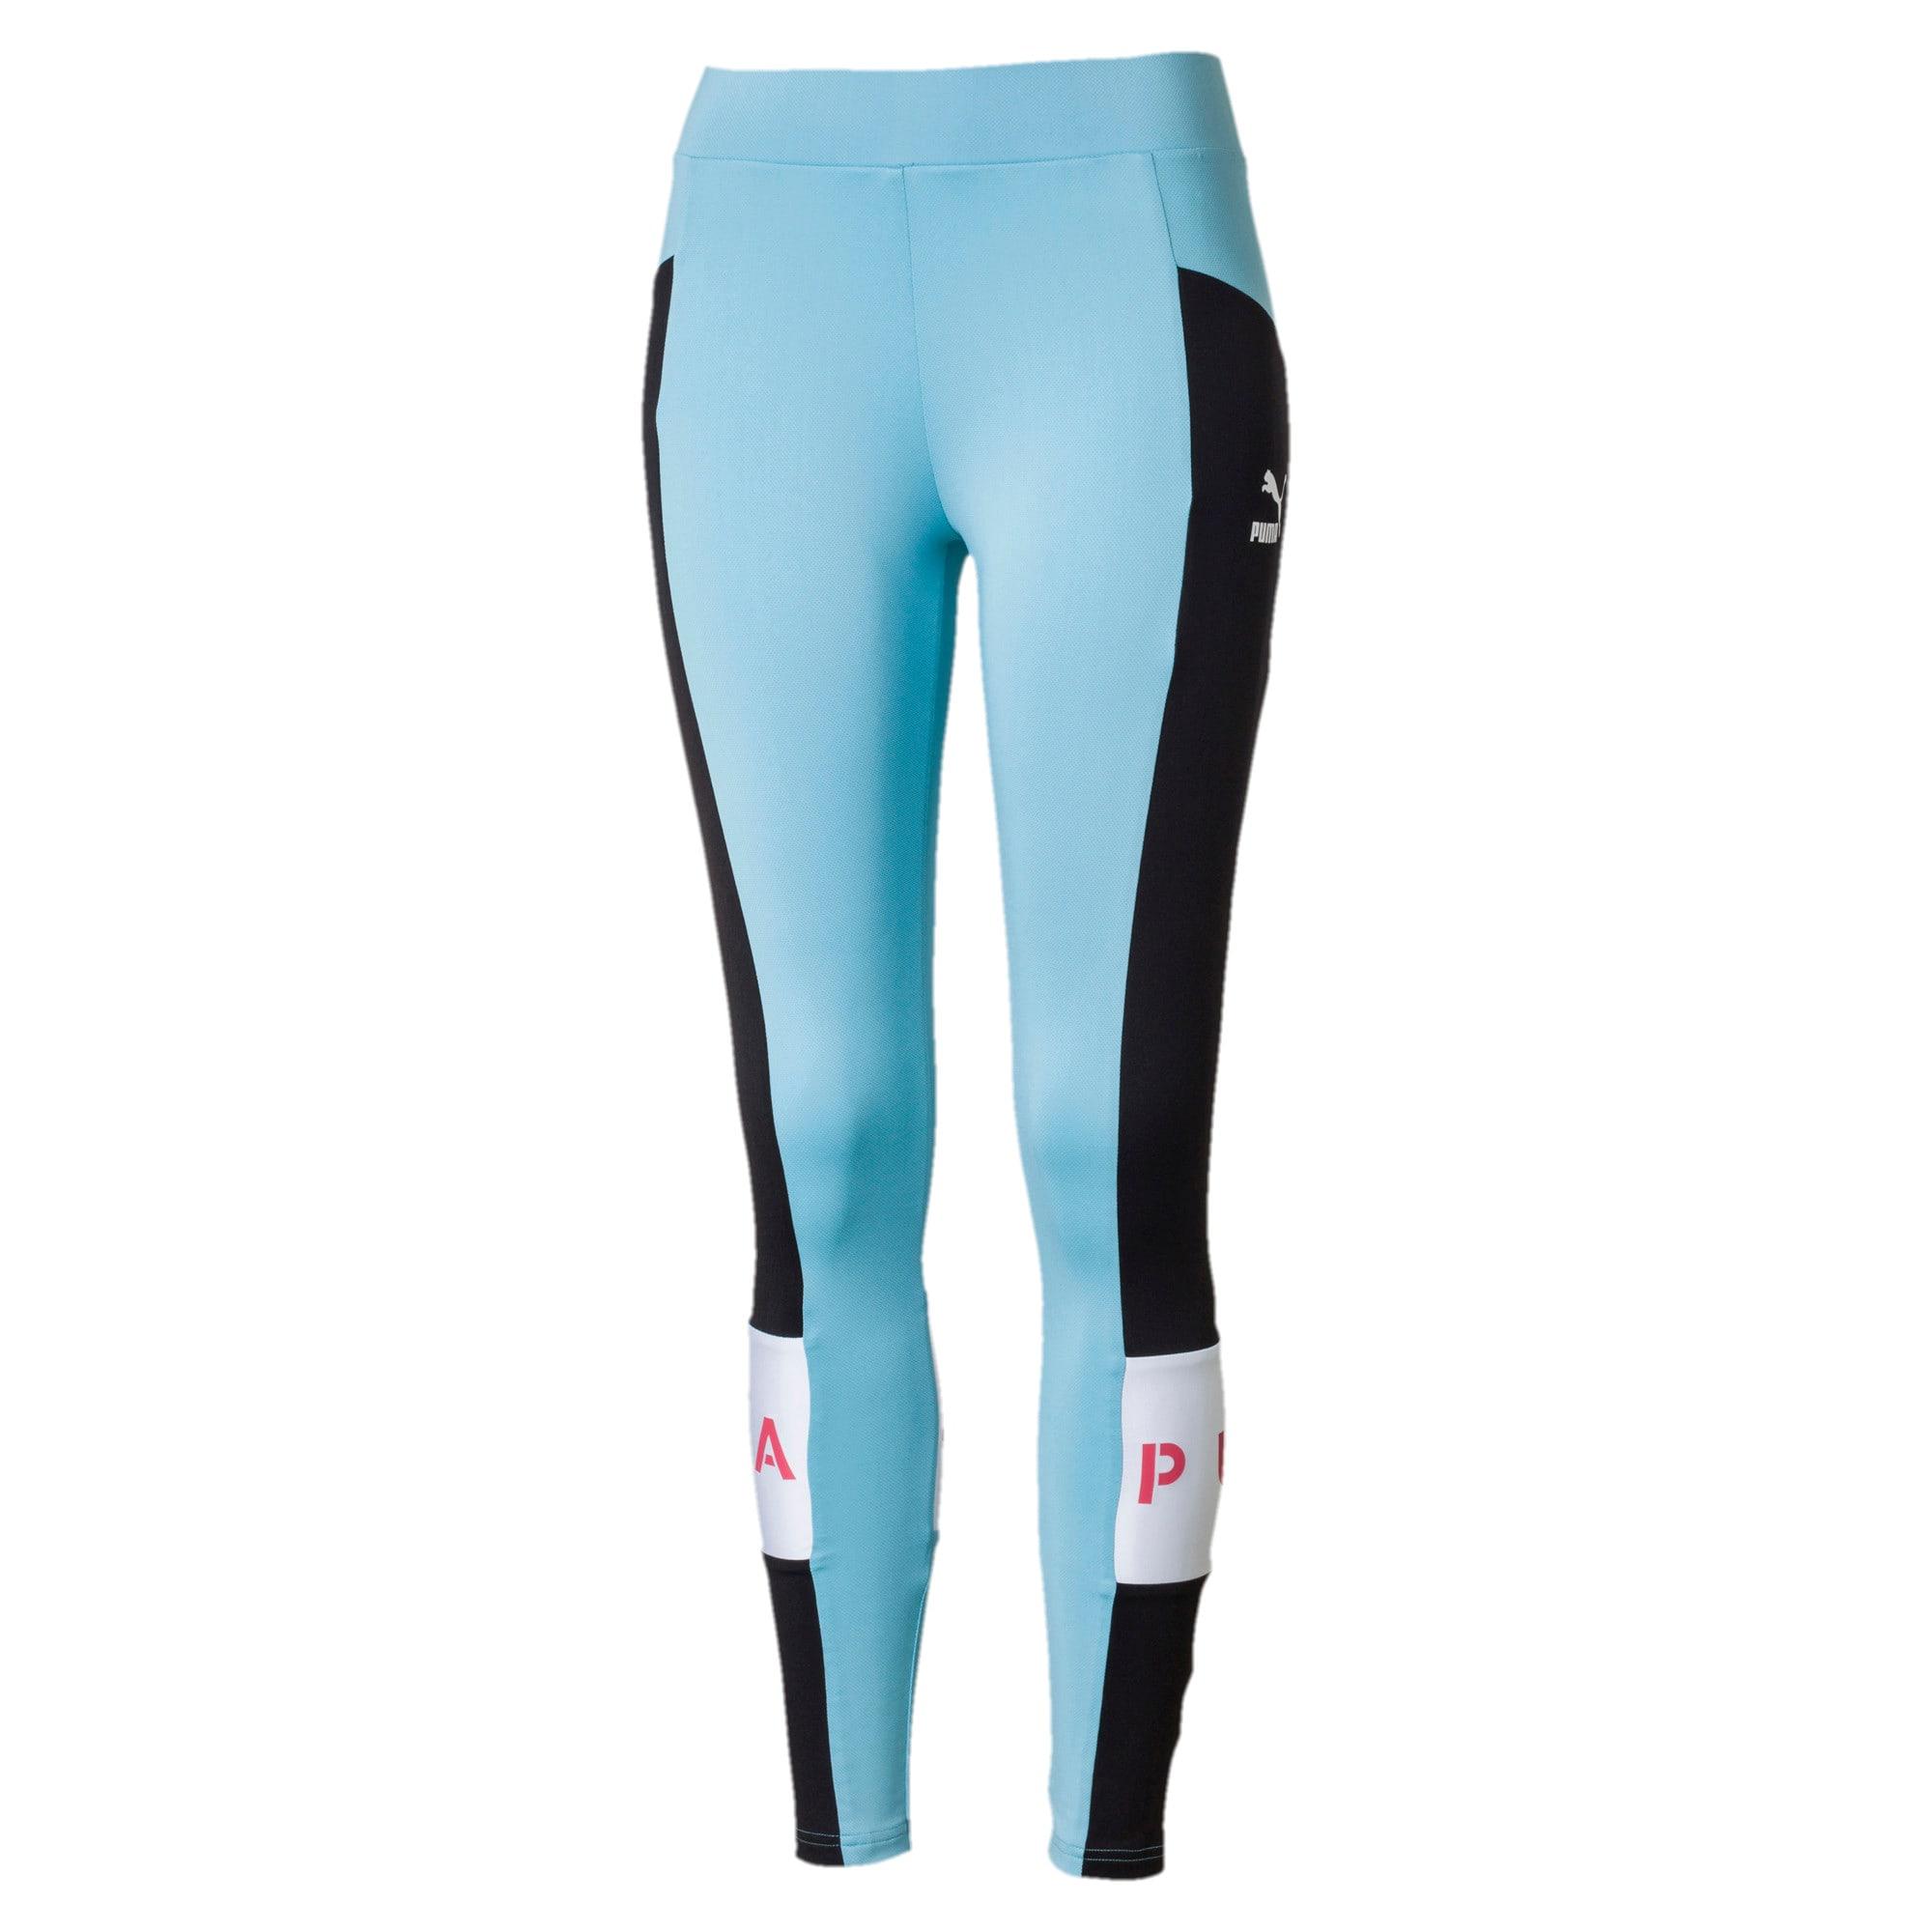 Thumbnail 4 van PUMA XTG legging voor vrouwen, Milky Blue, medium